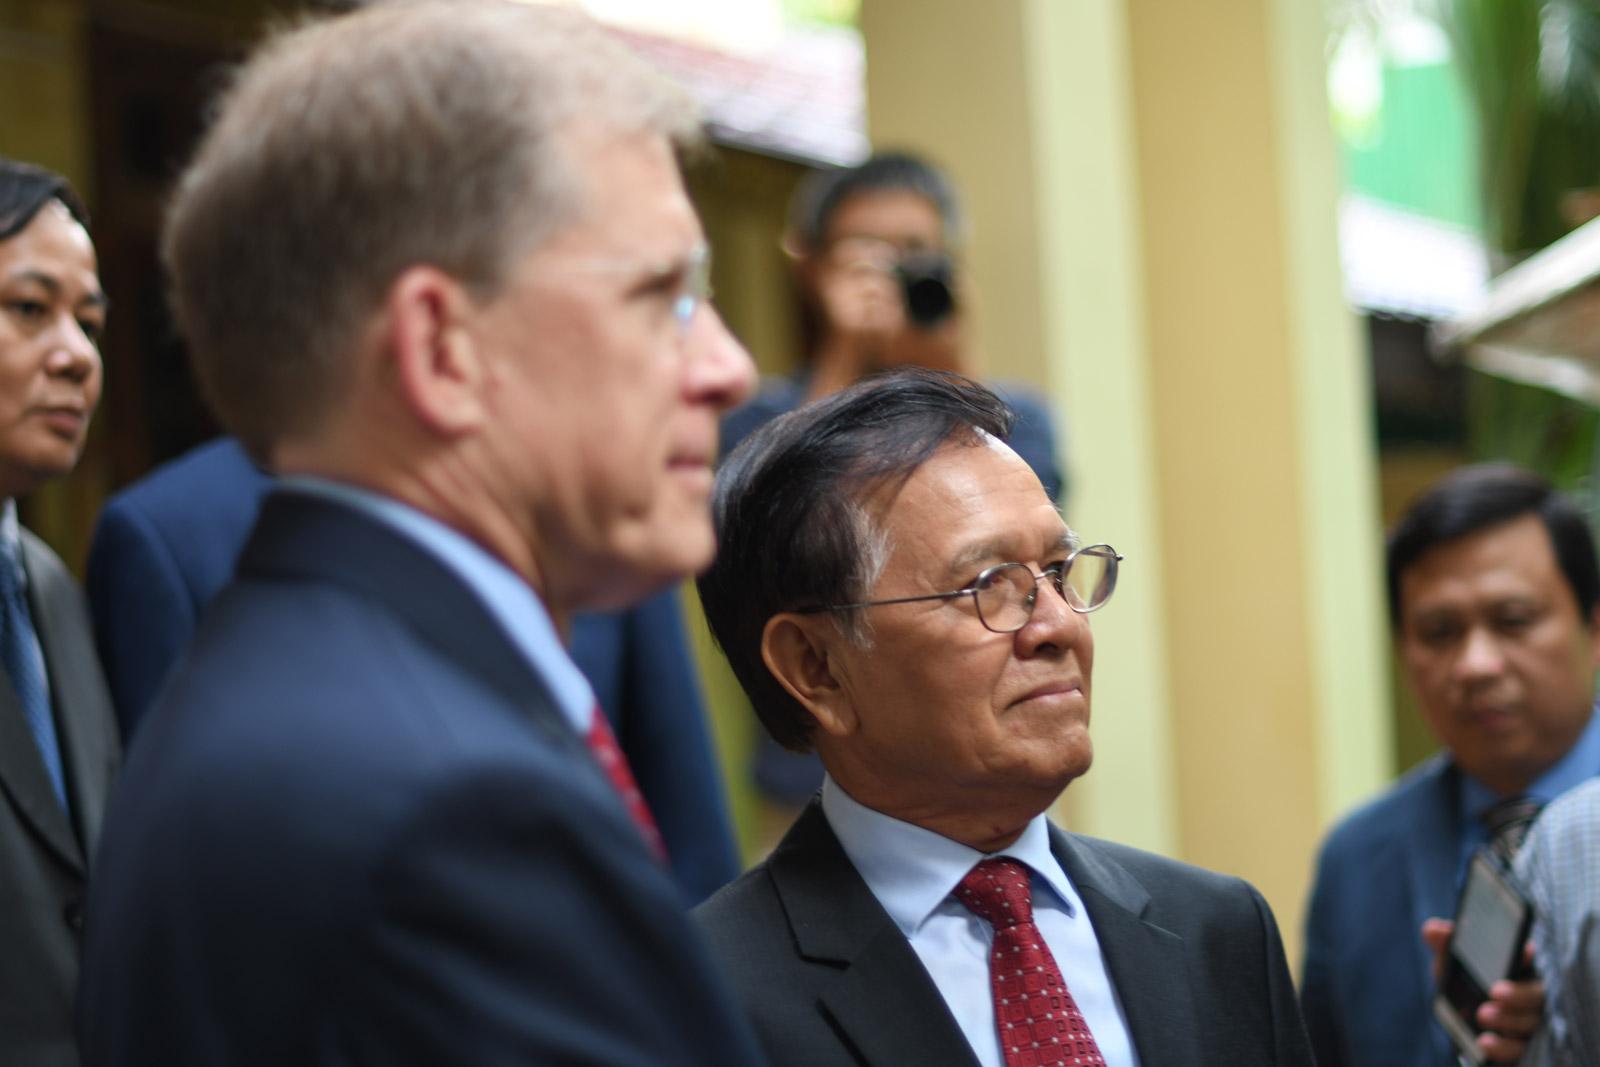 Kem Sokha pictured ahead of his meeting with U.S. Ambassador W. Patrick Murphy (L) on Nov. 11 2019. Photo: Simon Roughneen